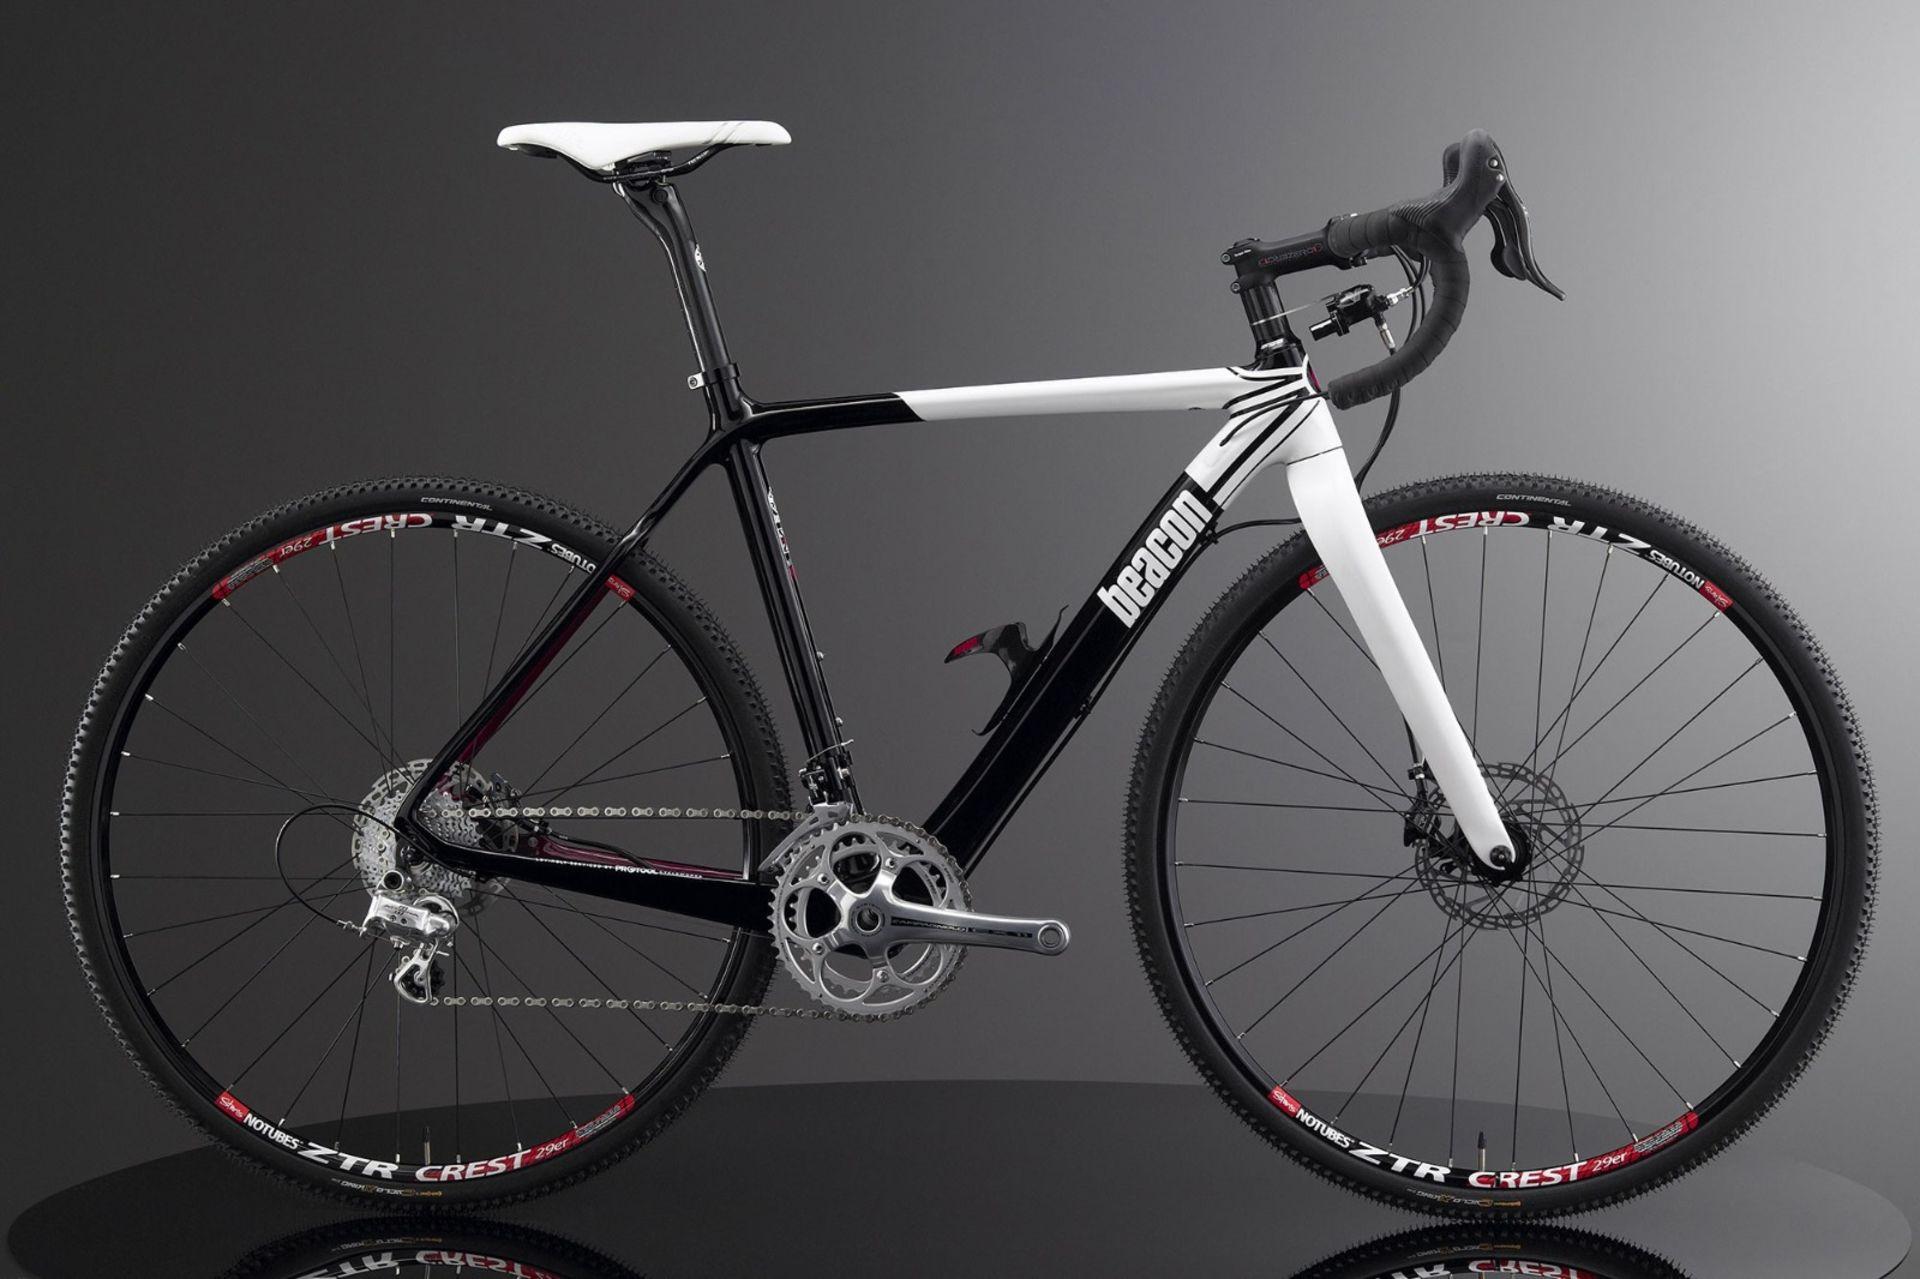 Lot 24 - 1 x Beacon Model BF-45, Size 560, Carbon Fibre Bike Frame in Black & White.